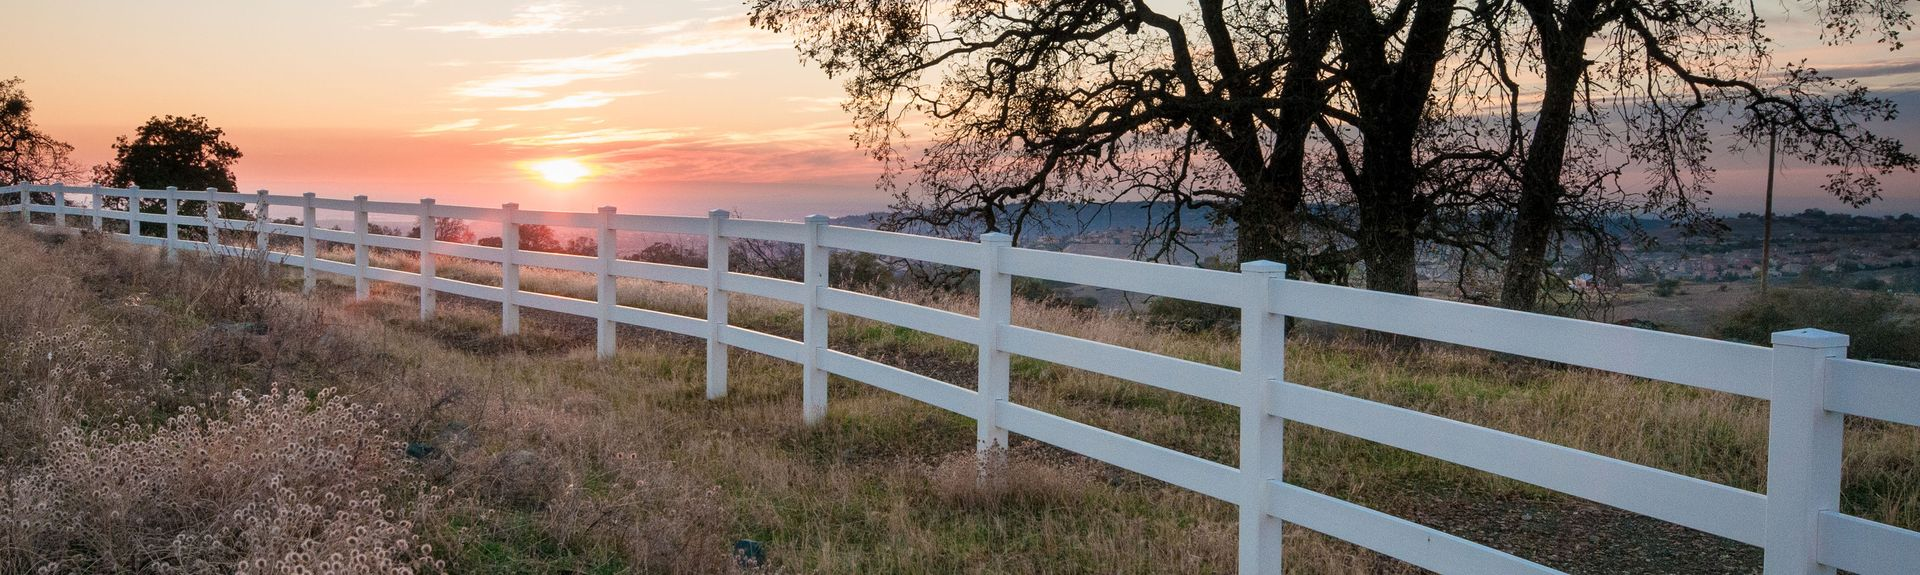 El Dorado Hills, Californië, Verenigde Staten